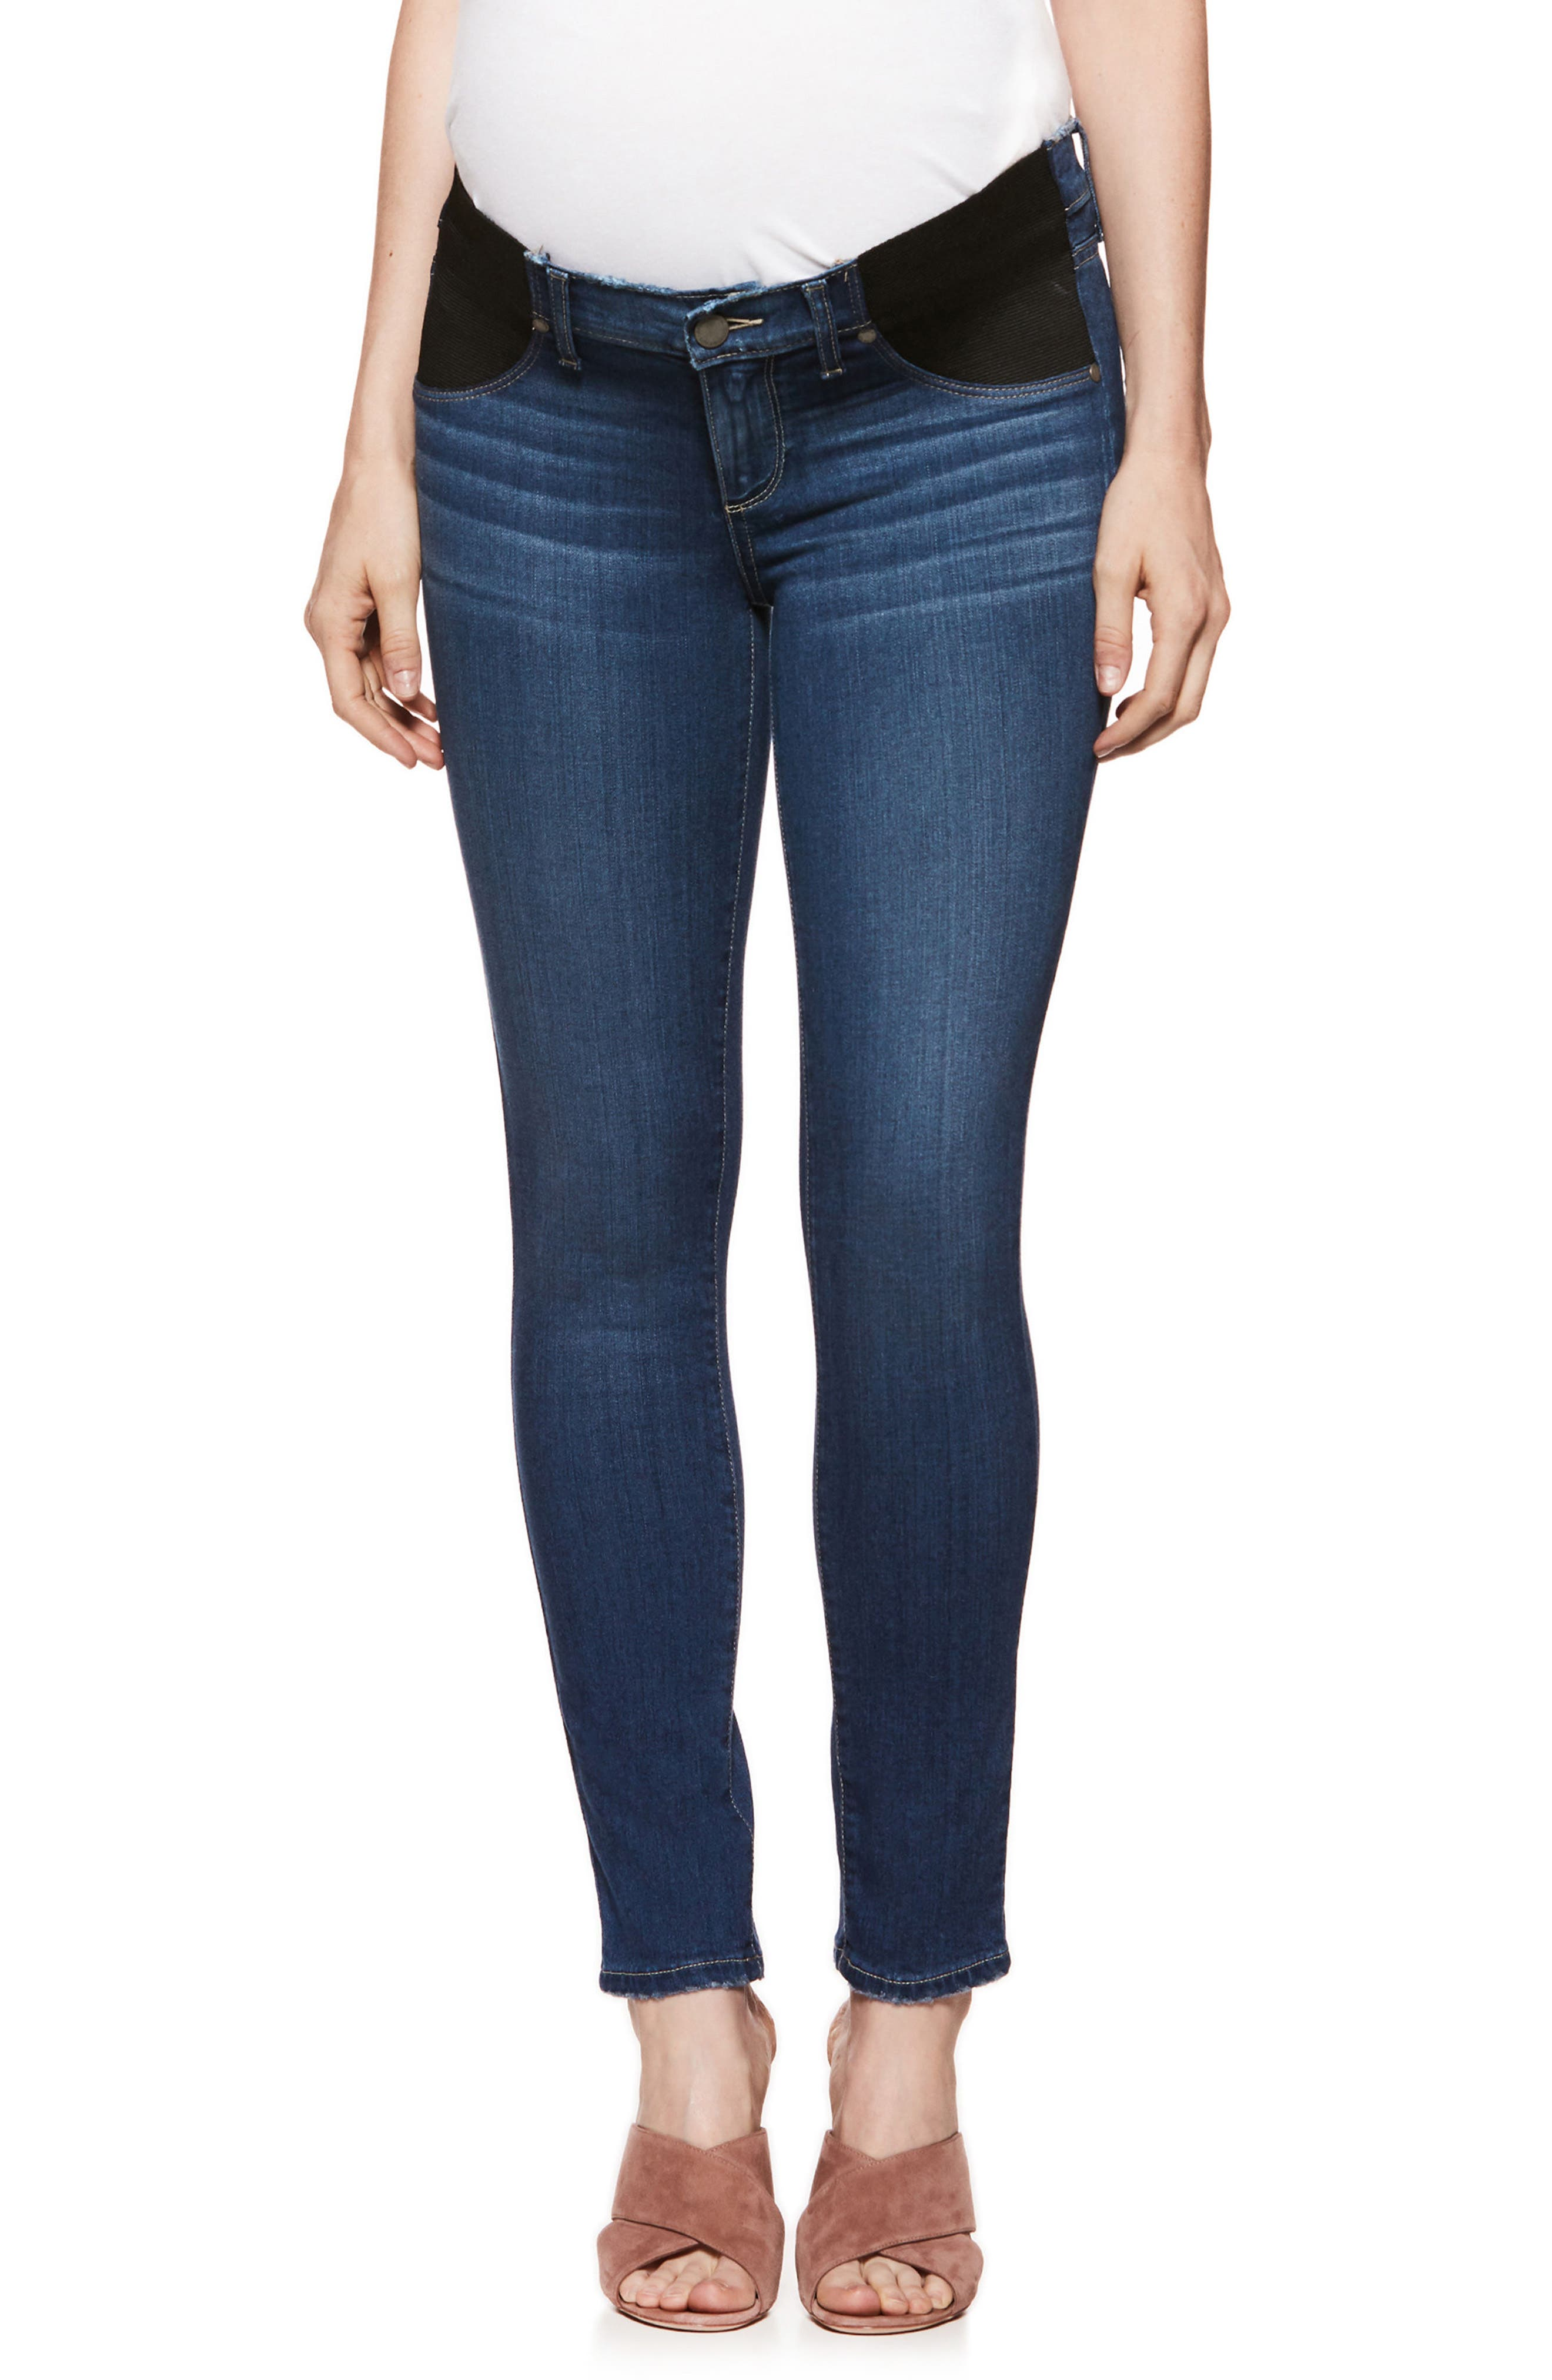 PAIGE Transcend - Verdugo Ultra Skinny Maternity Jeans (Henderson)